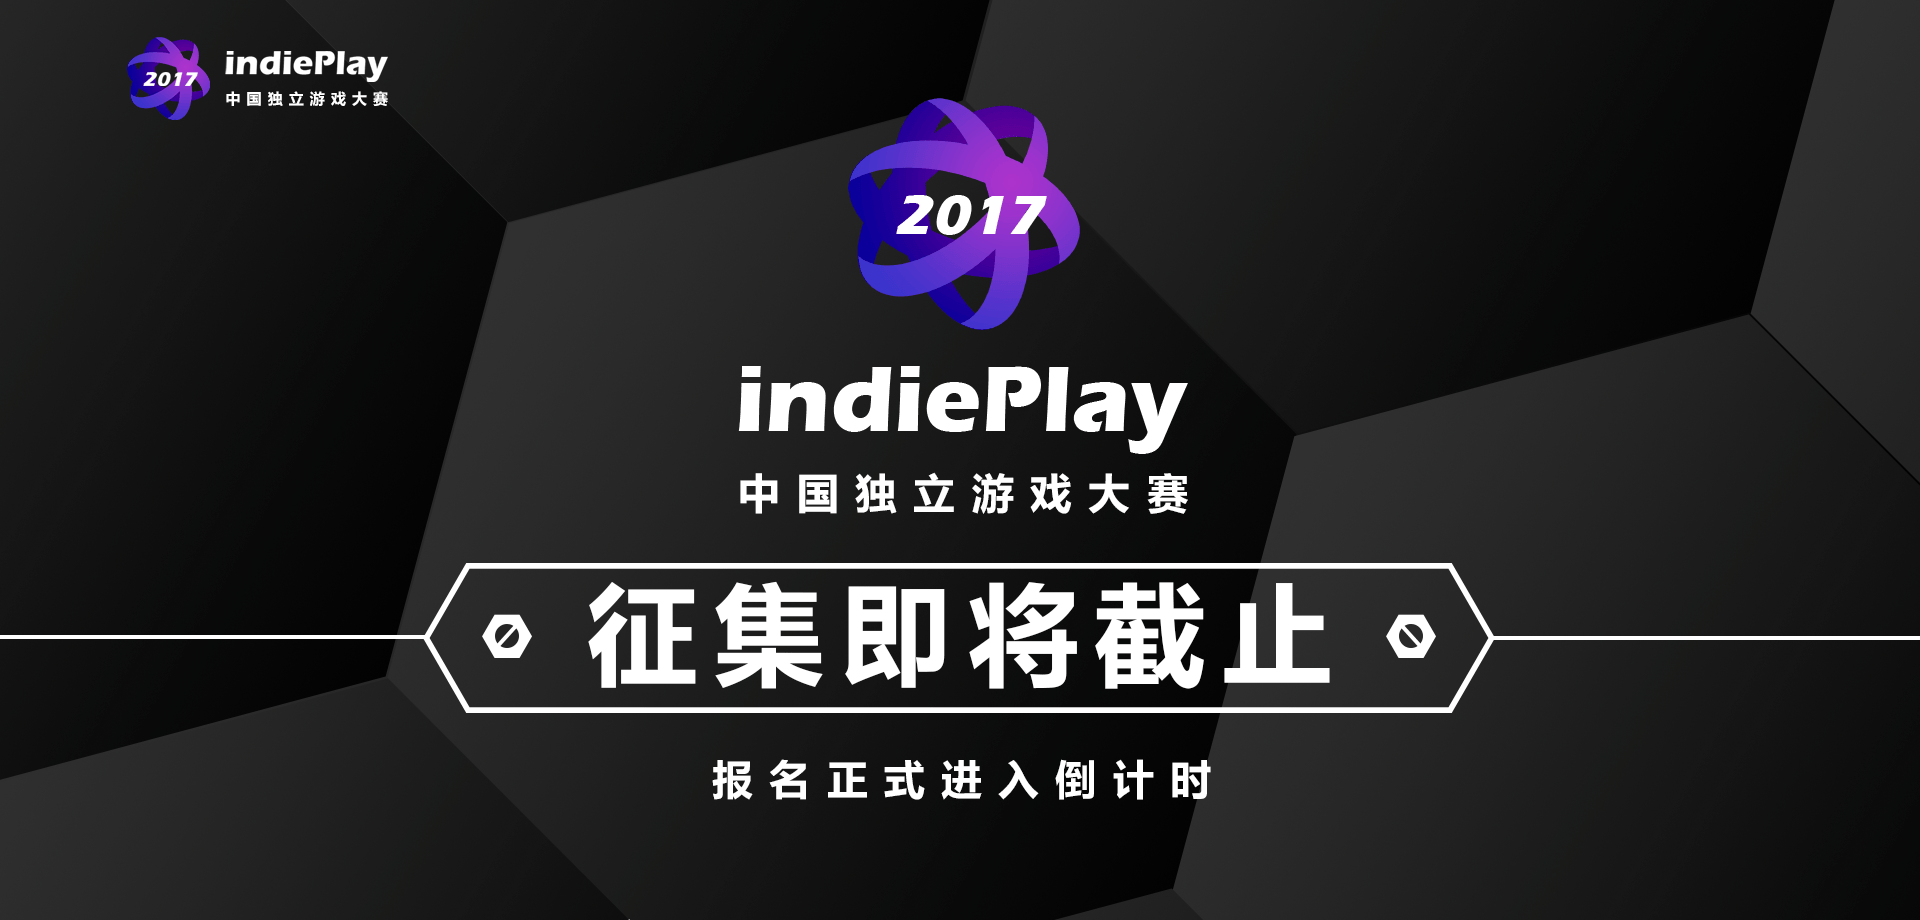 2017 indiePlay 中國獨立遊戲大賽報名進入倒計時